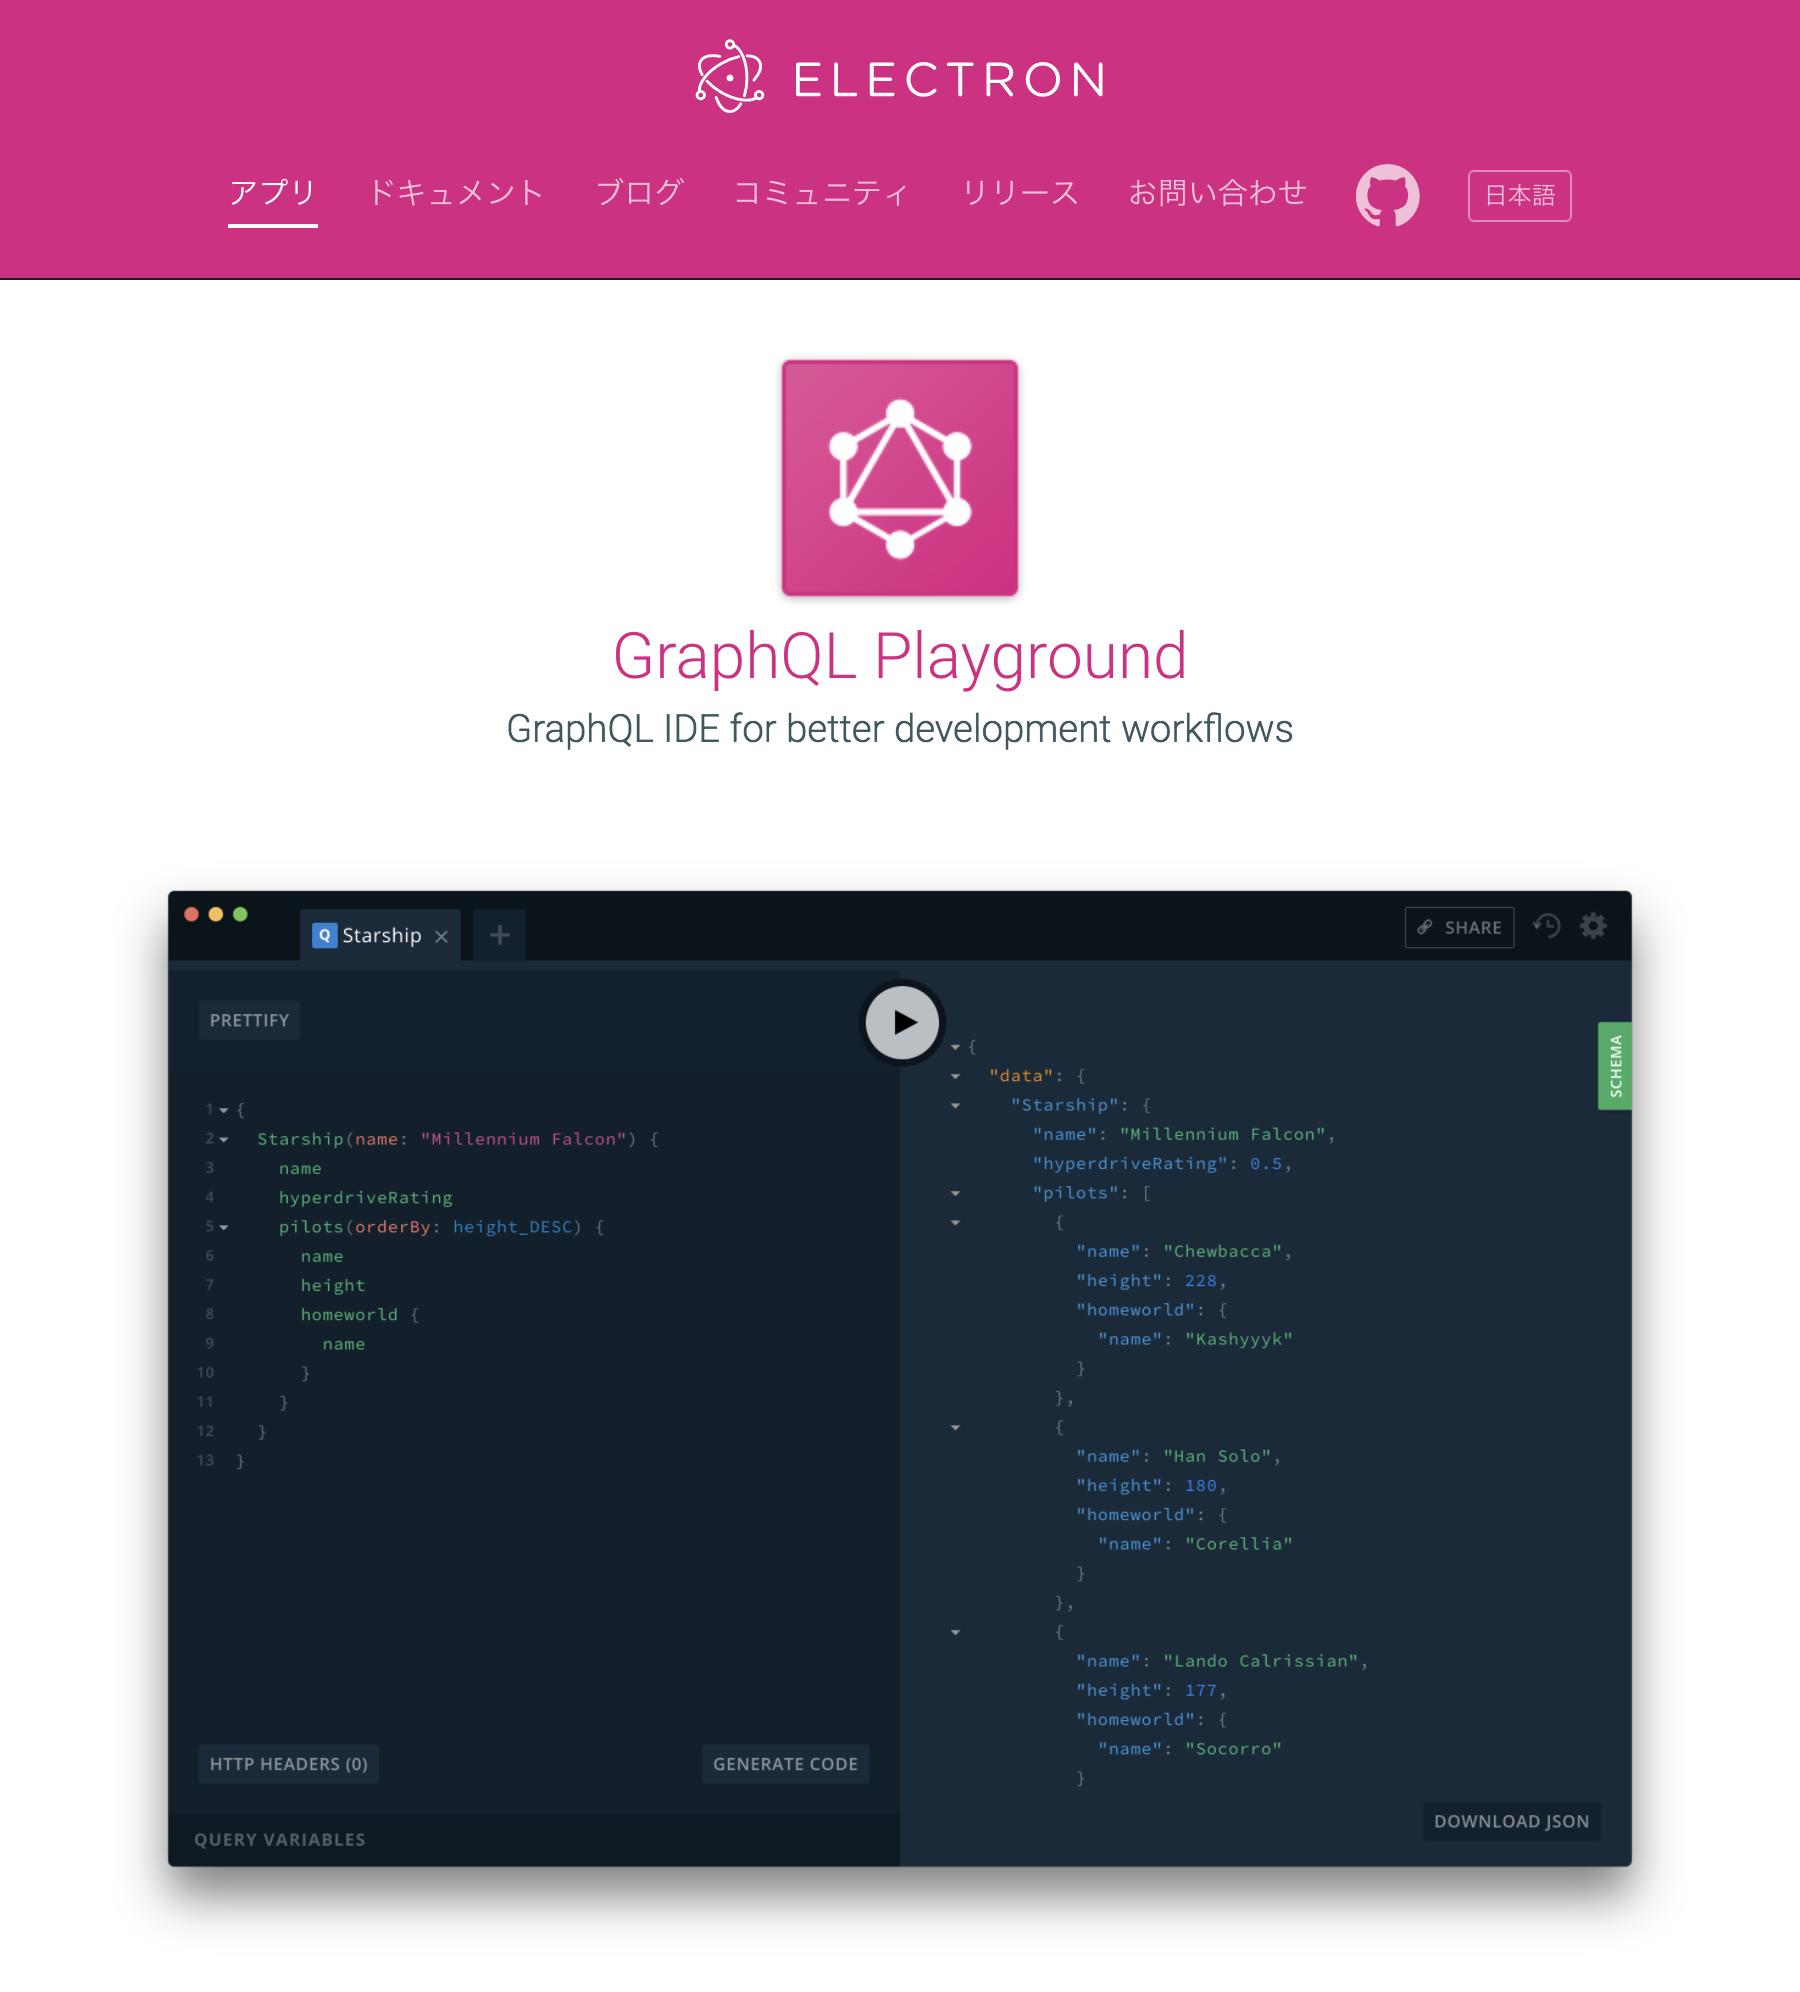 GraphQL Playground